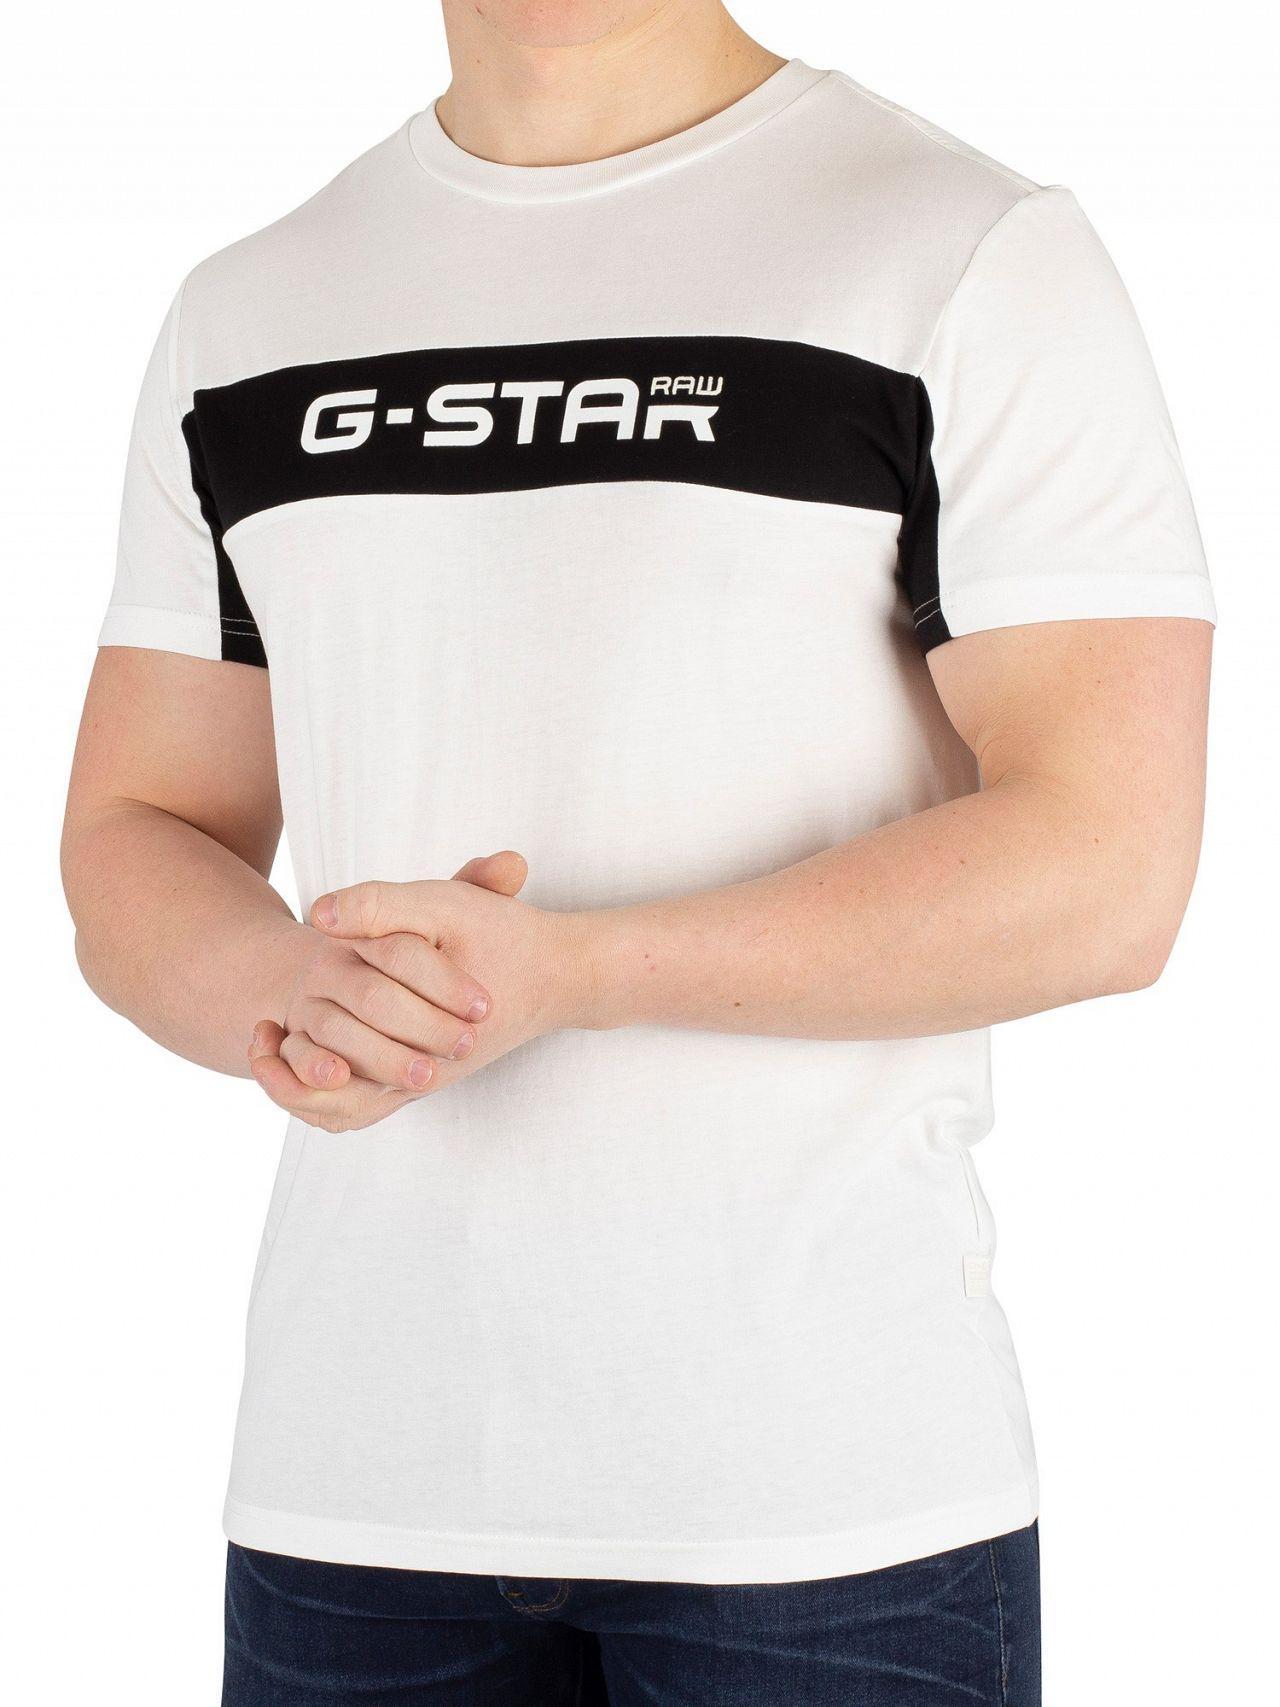 dffaf652b61 Lyst - G-Star RAW Milk/dark Black Graphic 80 T-shirt in Black for Men